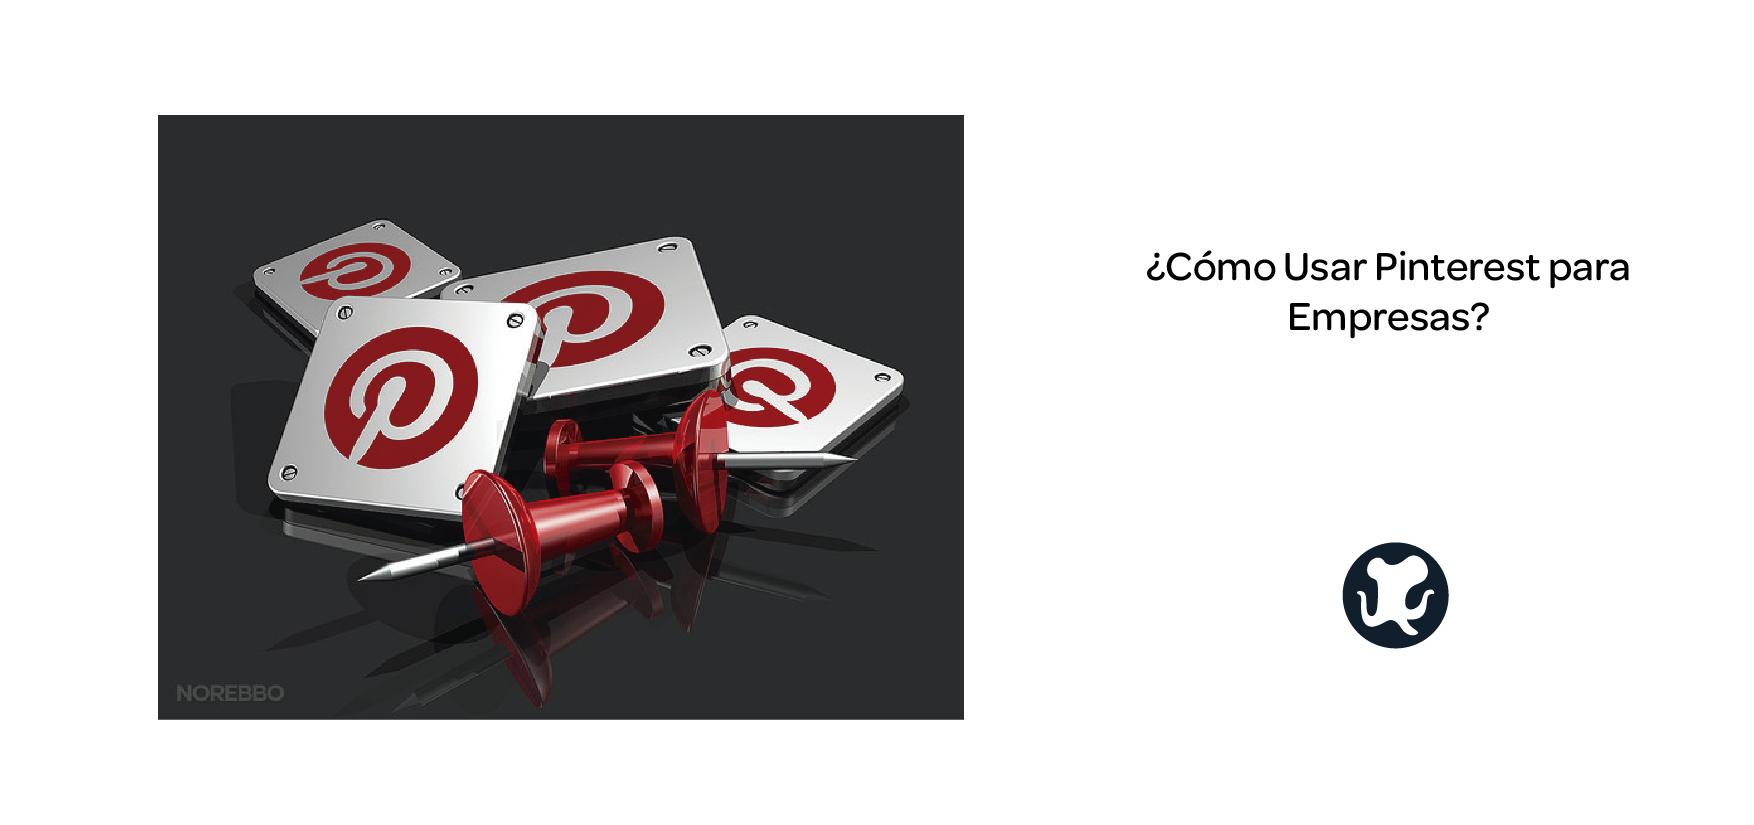 pinterest como usar para empresas